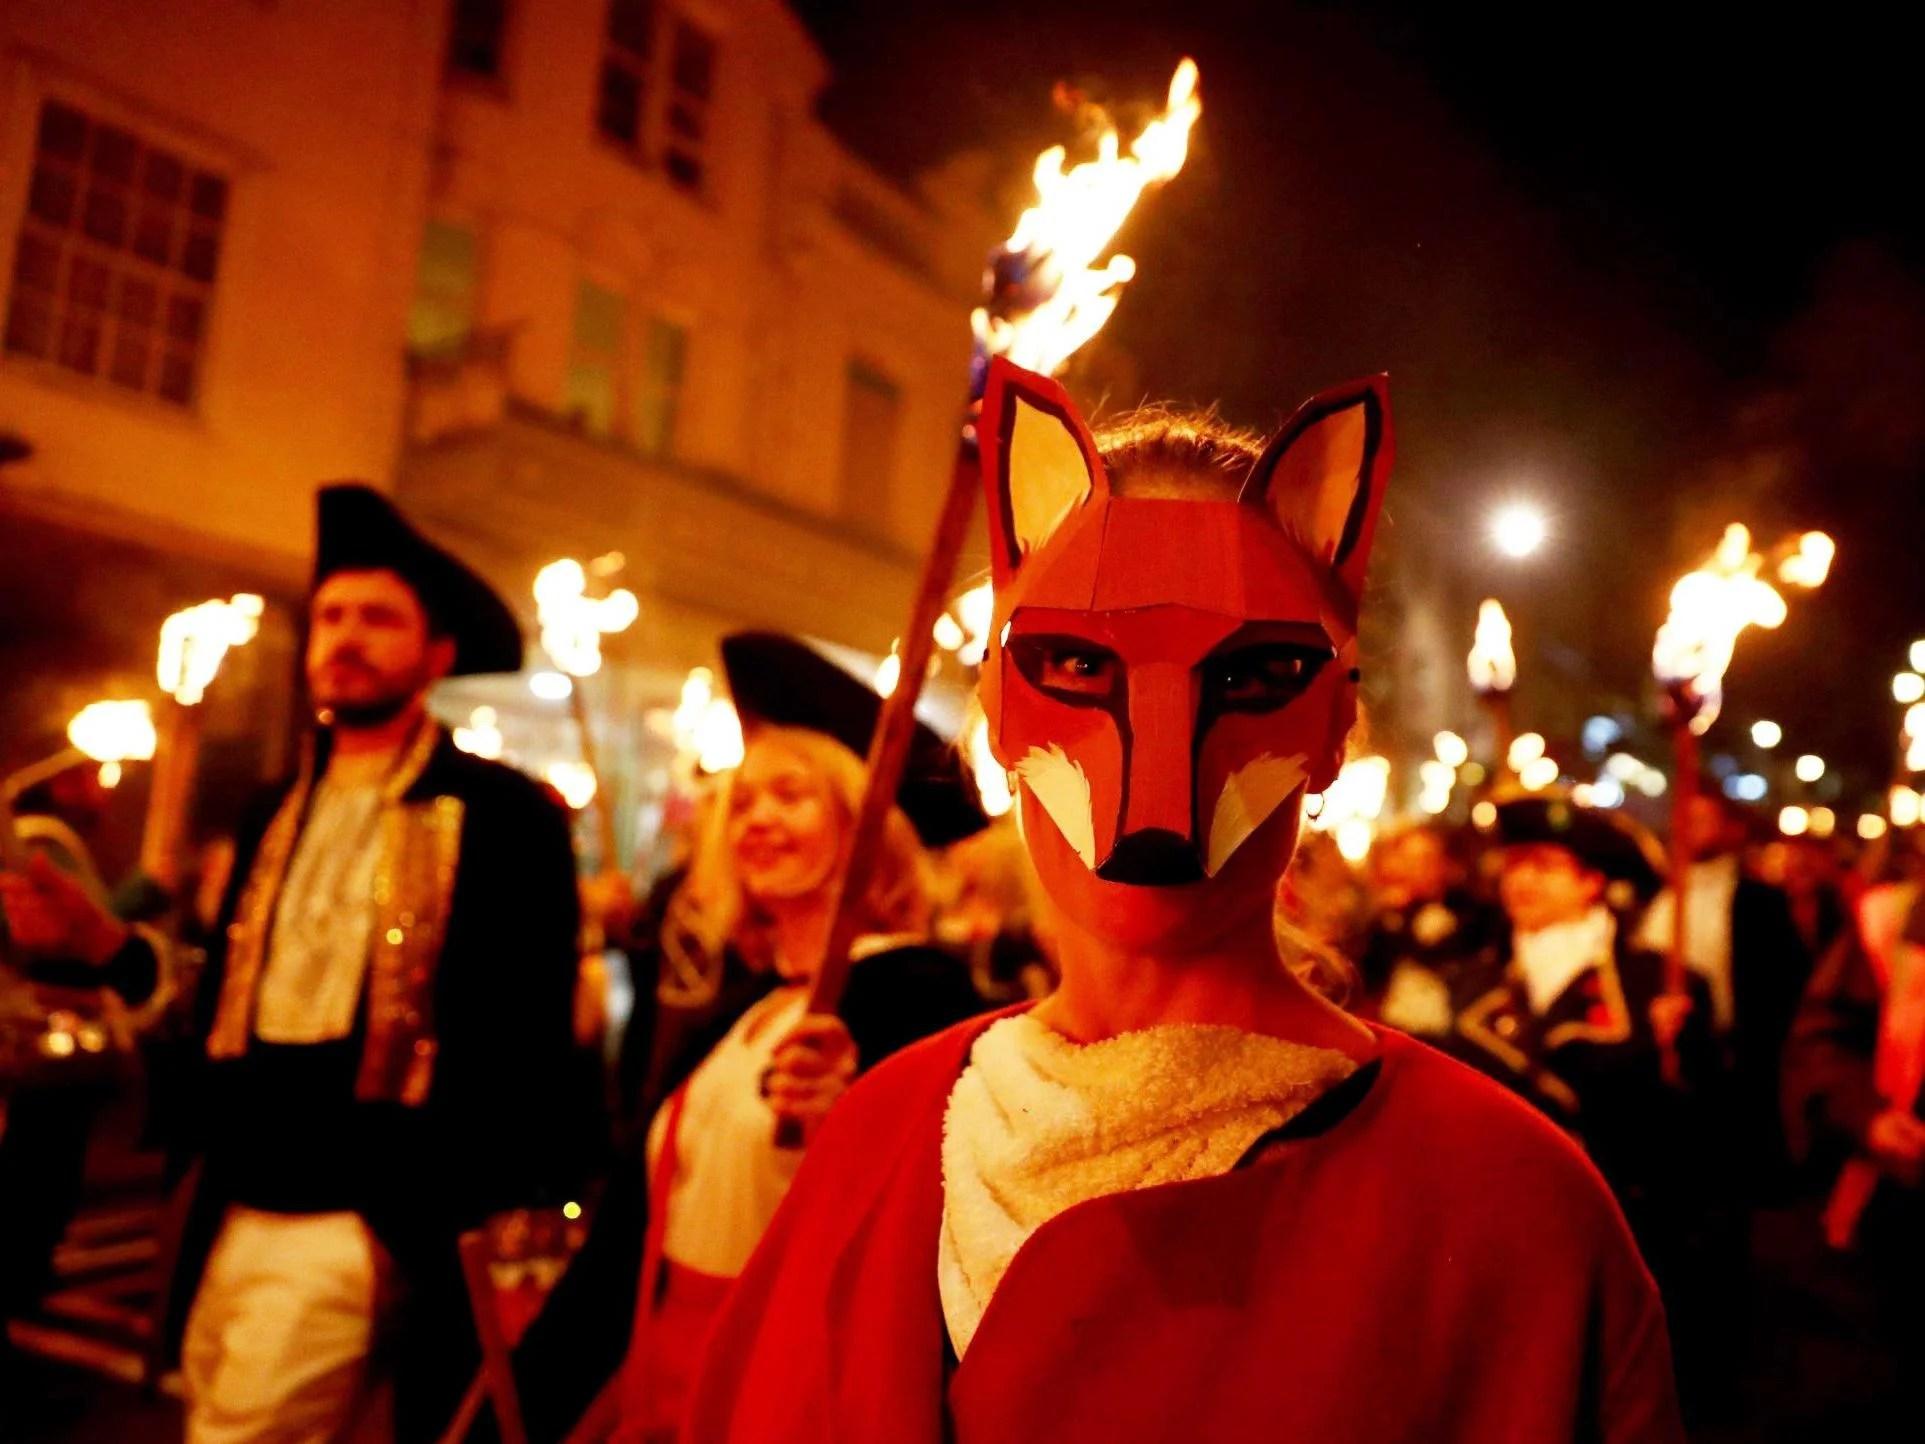 Lewes Bonfire The Sussex Town Famed For Burning Effigies